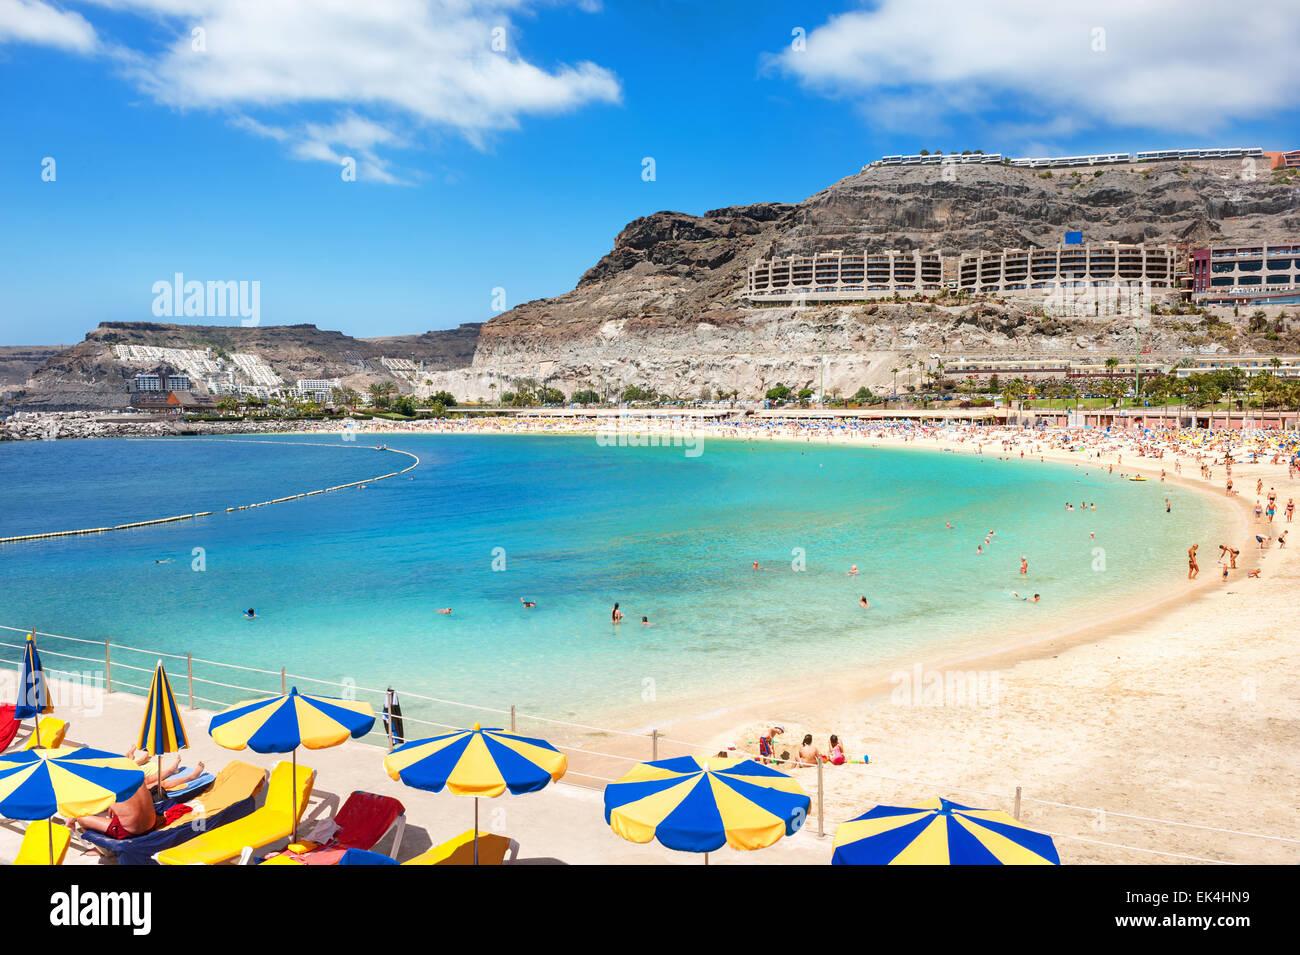 Playa de Amadores Strand. Gran Canaria, Kanarische Inseln. Spanien Stockbild